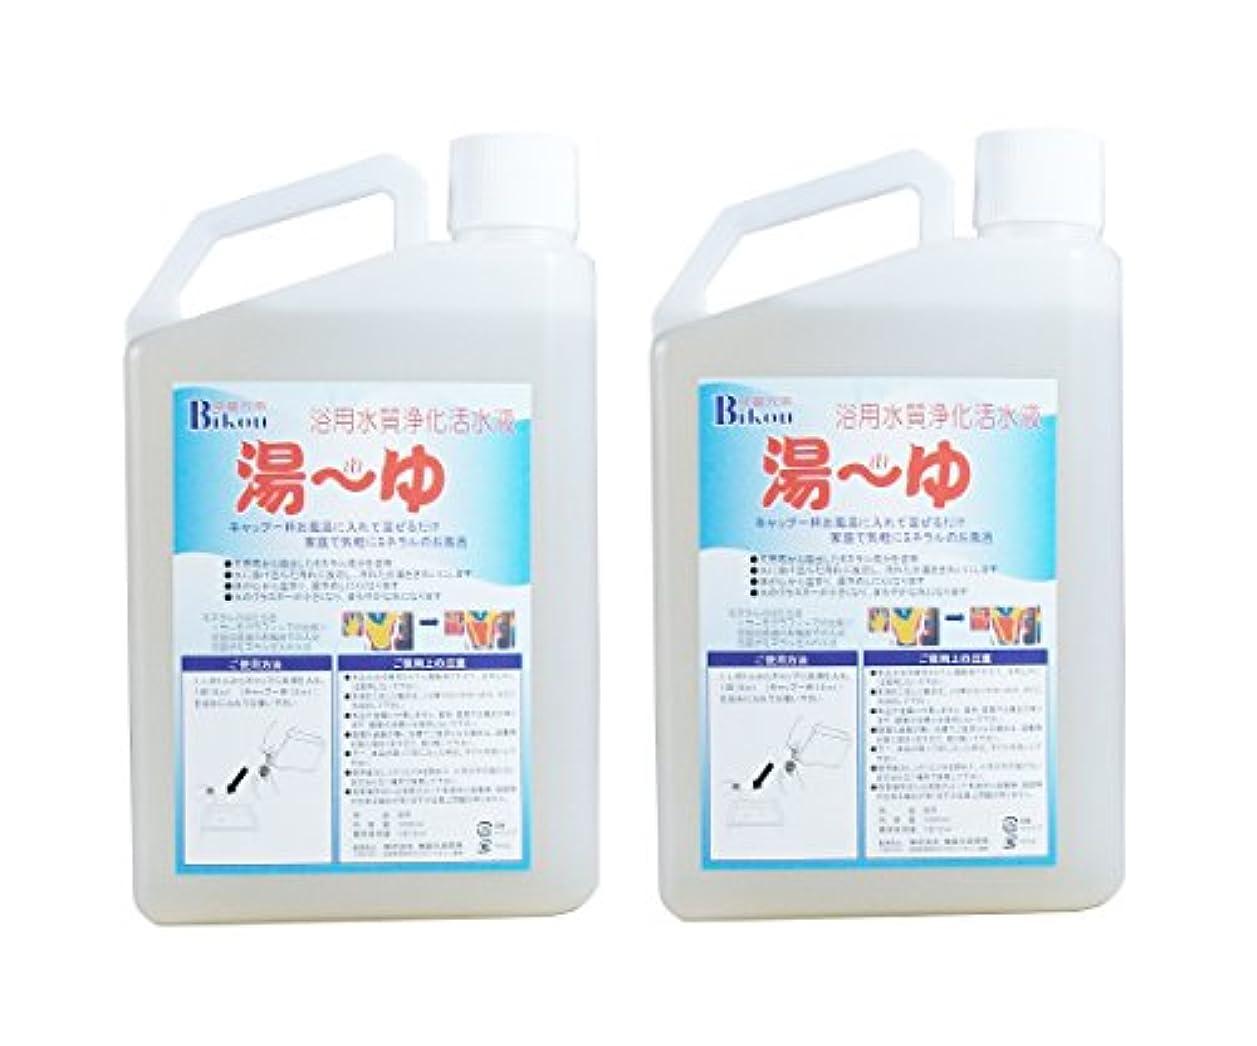 スキニー埋める対応Bikou 浴用水質浄化活水液 湯ーゆ 2本組(1000ml×2) 24時間風呂用入浴剤